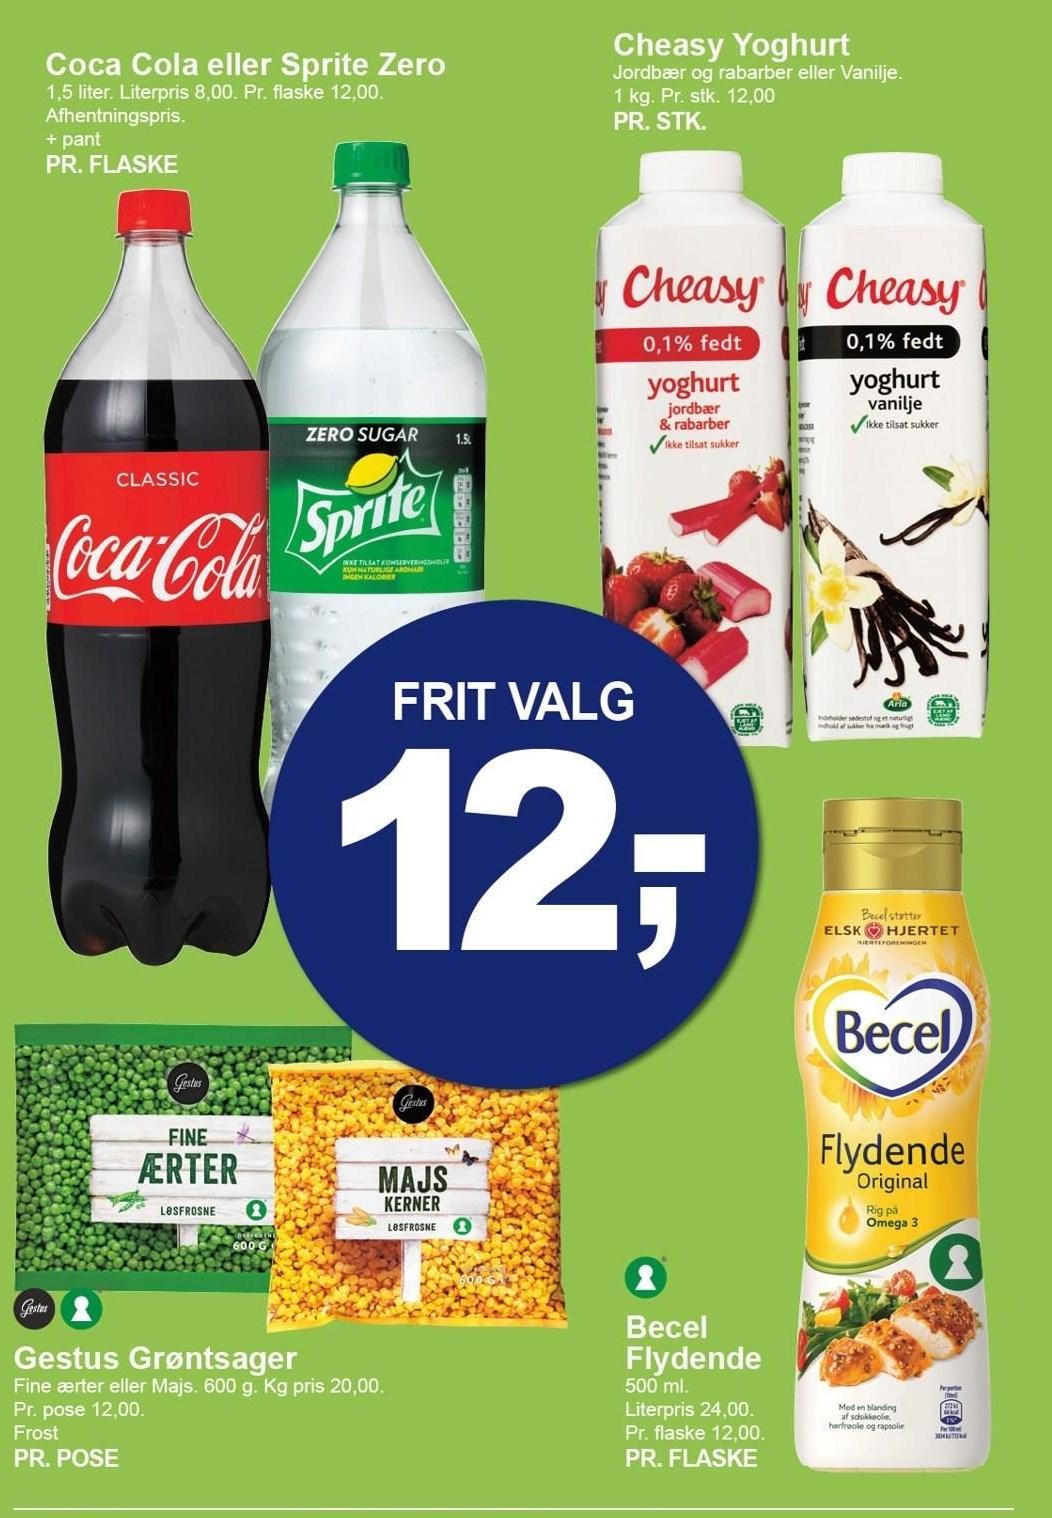 Fritvalgsmarked - Coca Cola eller Sprite Zero